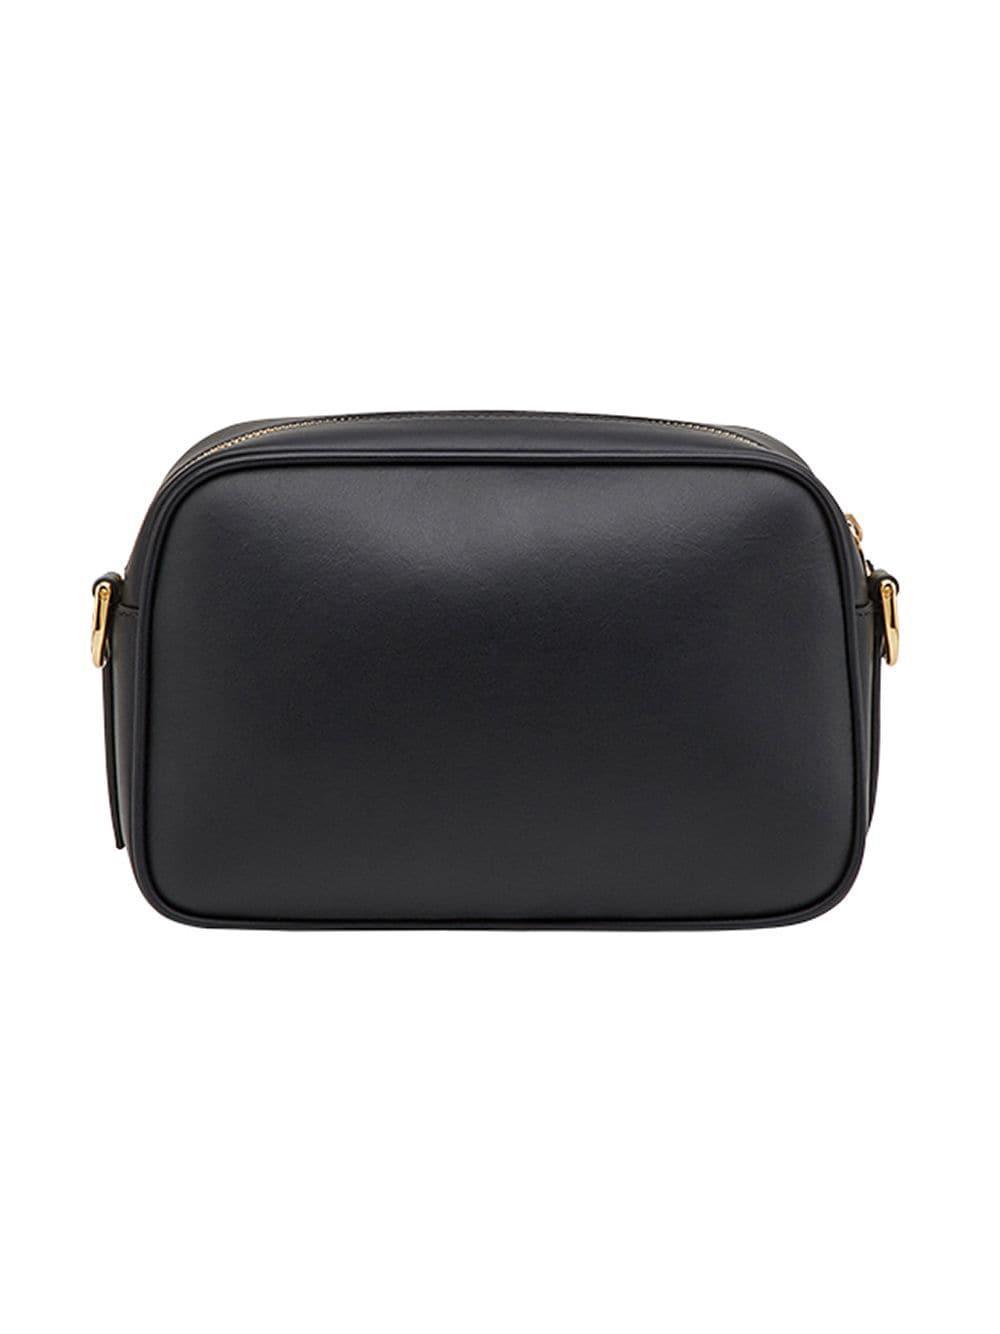 a6beec2cffdc Lyst - Fendi Camera Case Shoulder Bag in Black